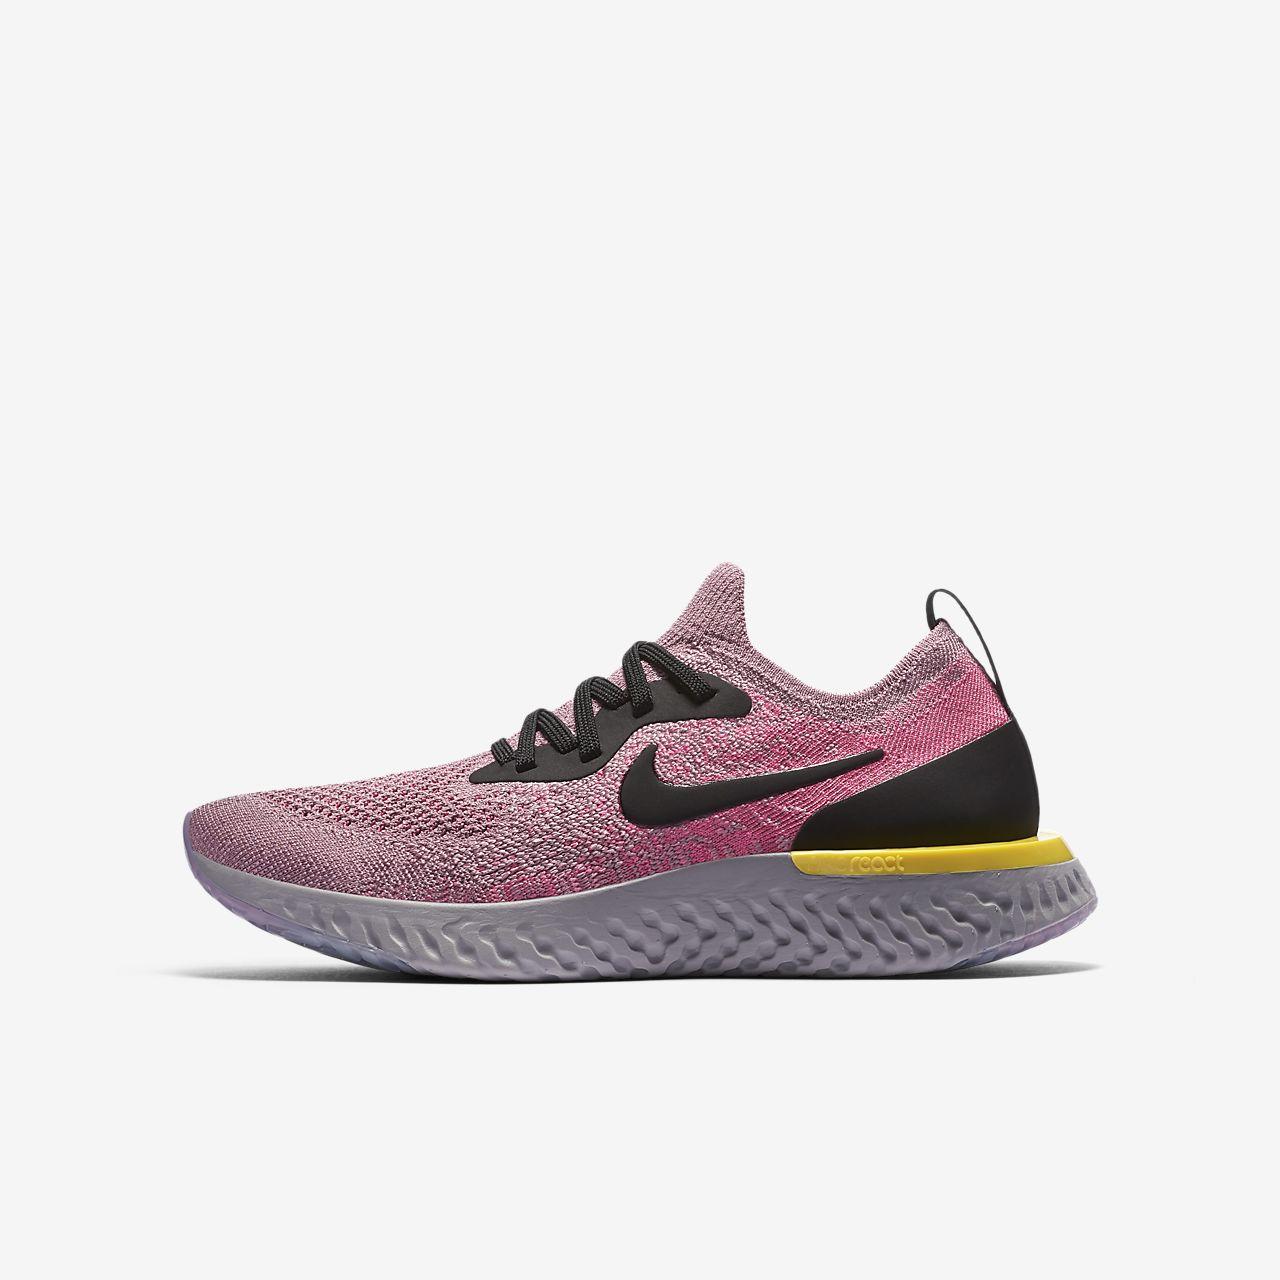 4d93c1d92 Nike Epic React Flyknit 1 Older Kids  Running Shoe. Nike.com BE